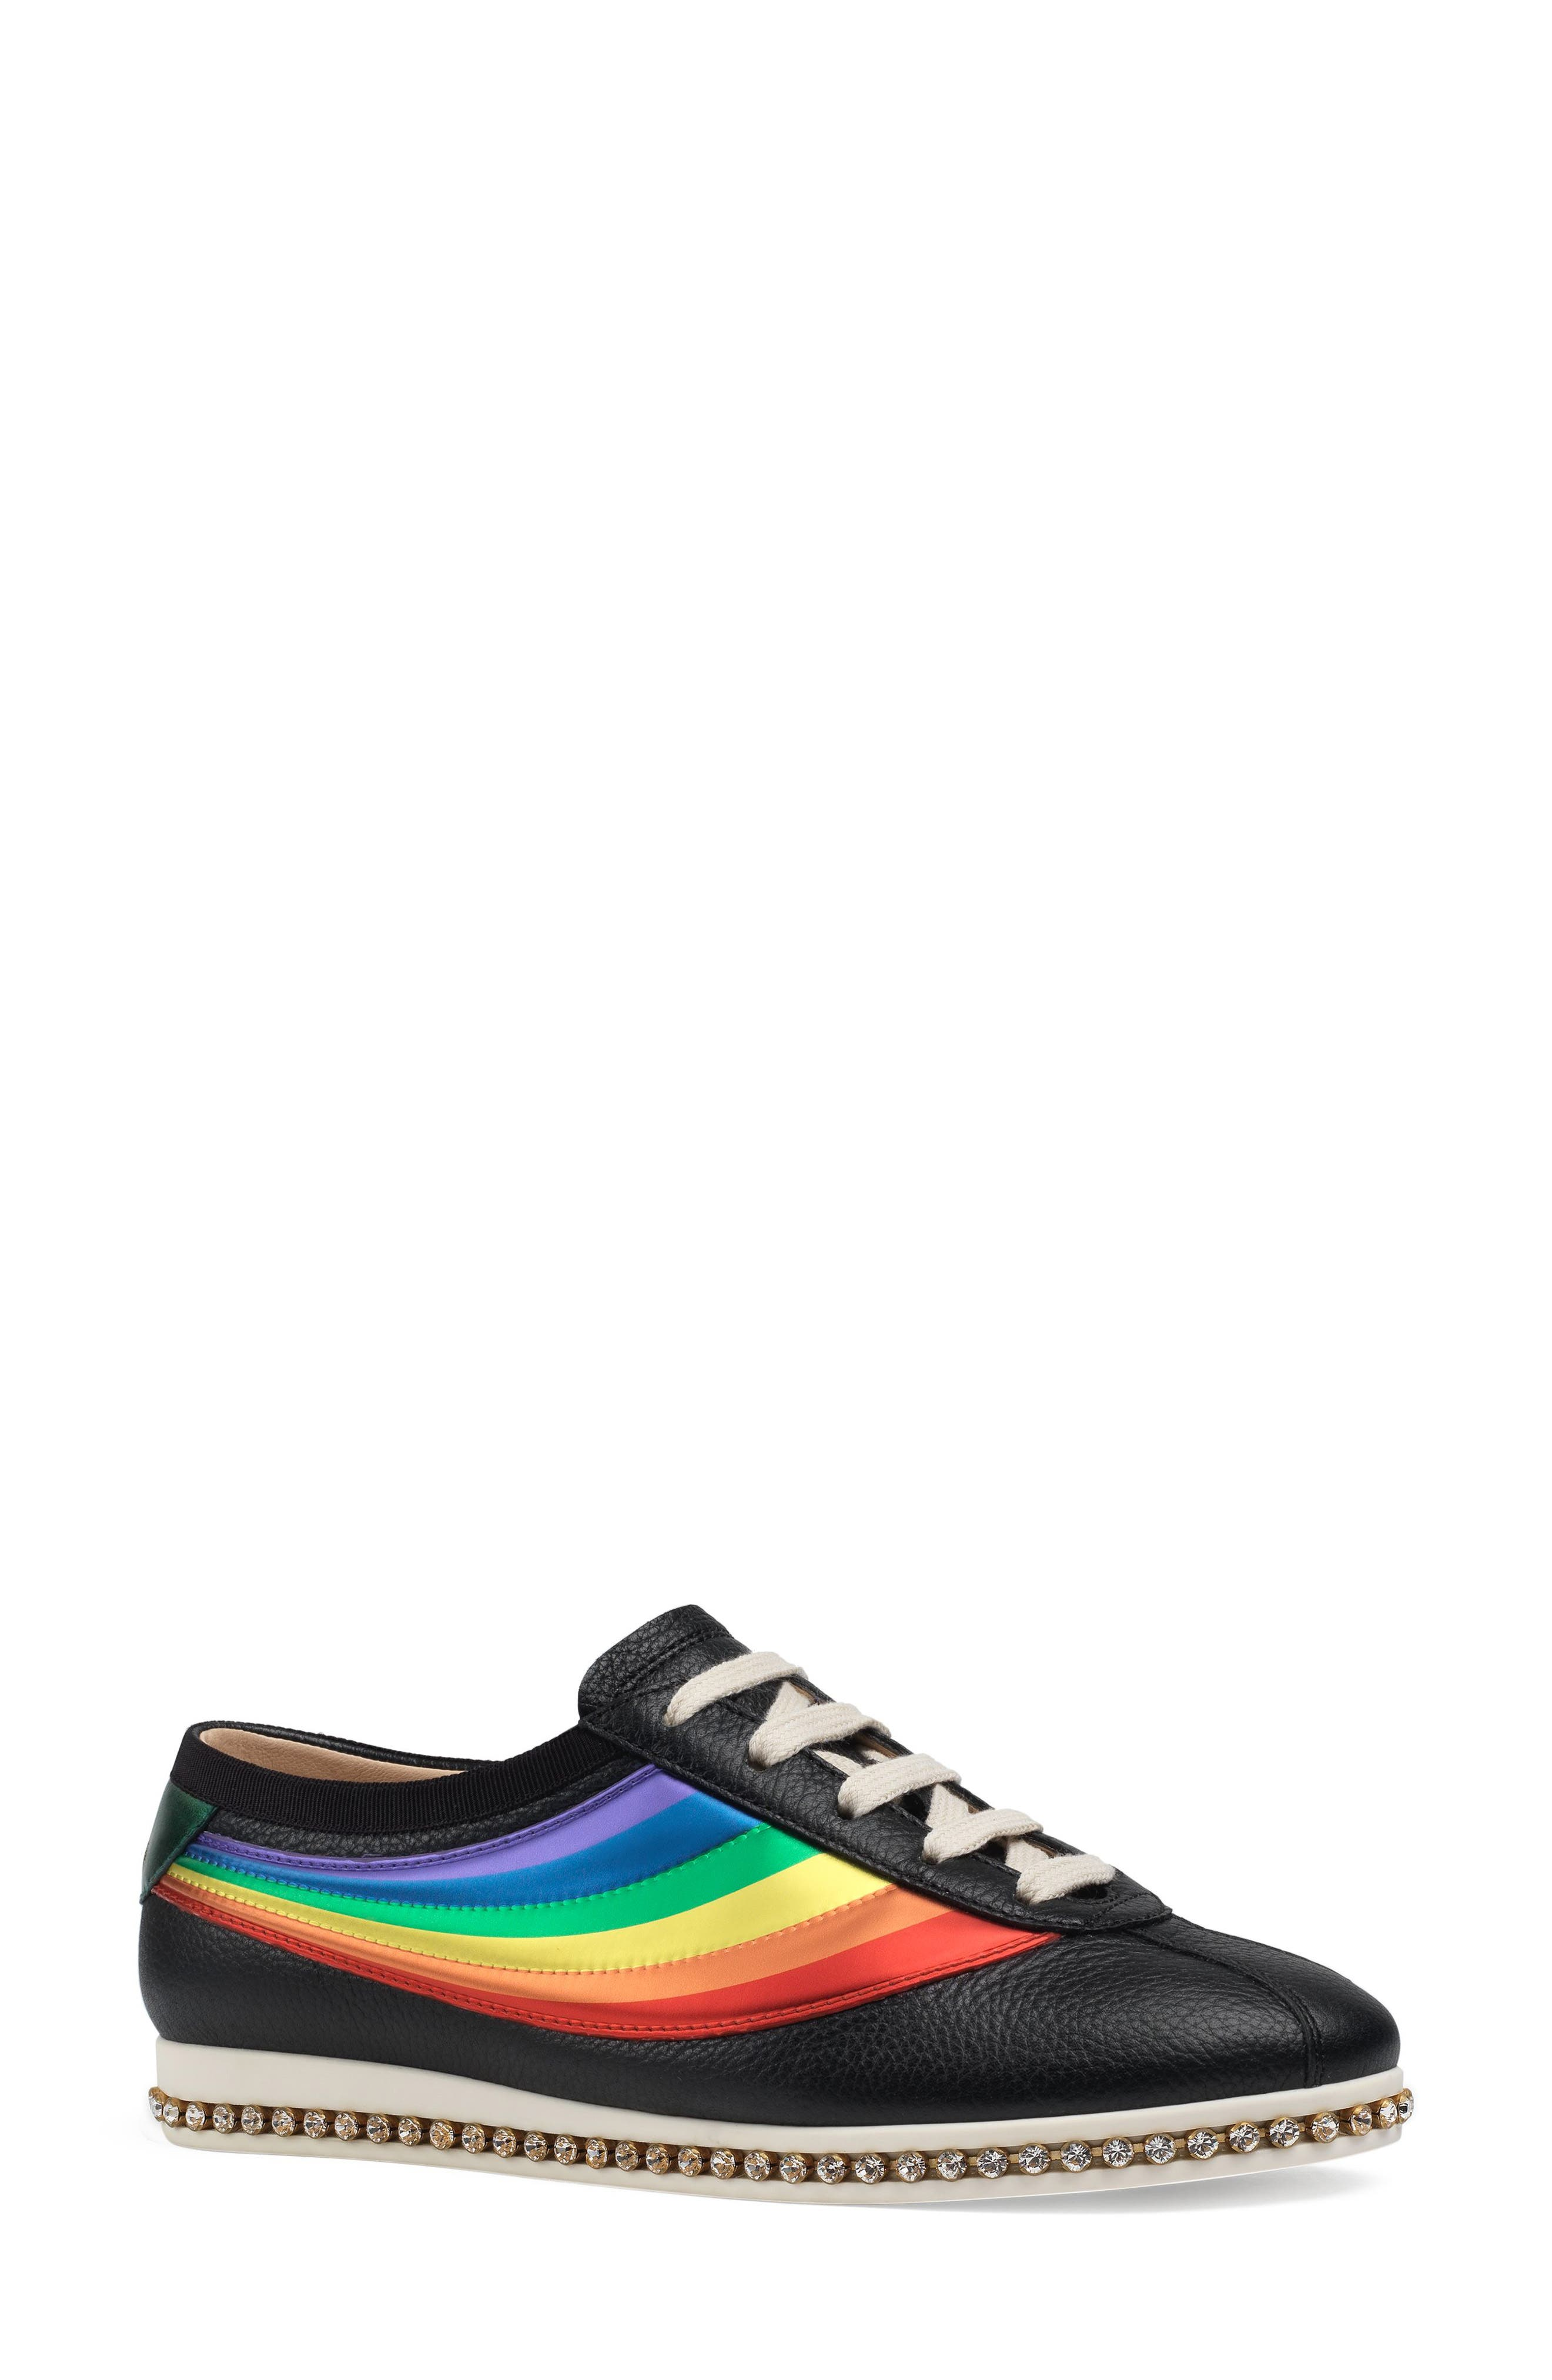 Falacer Sneaker,                         Main,                         color, Black